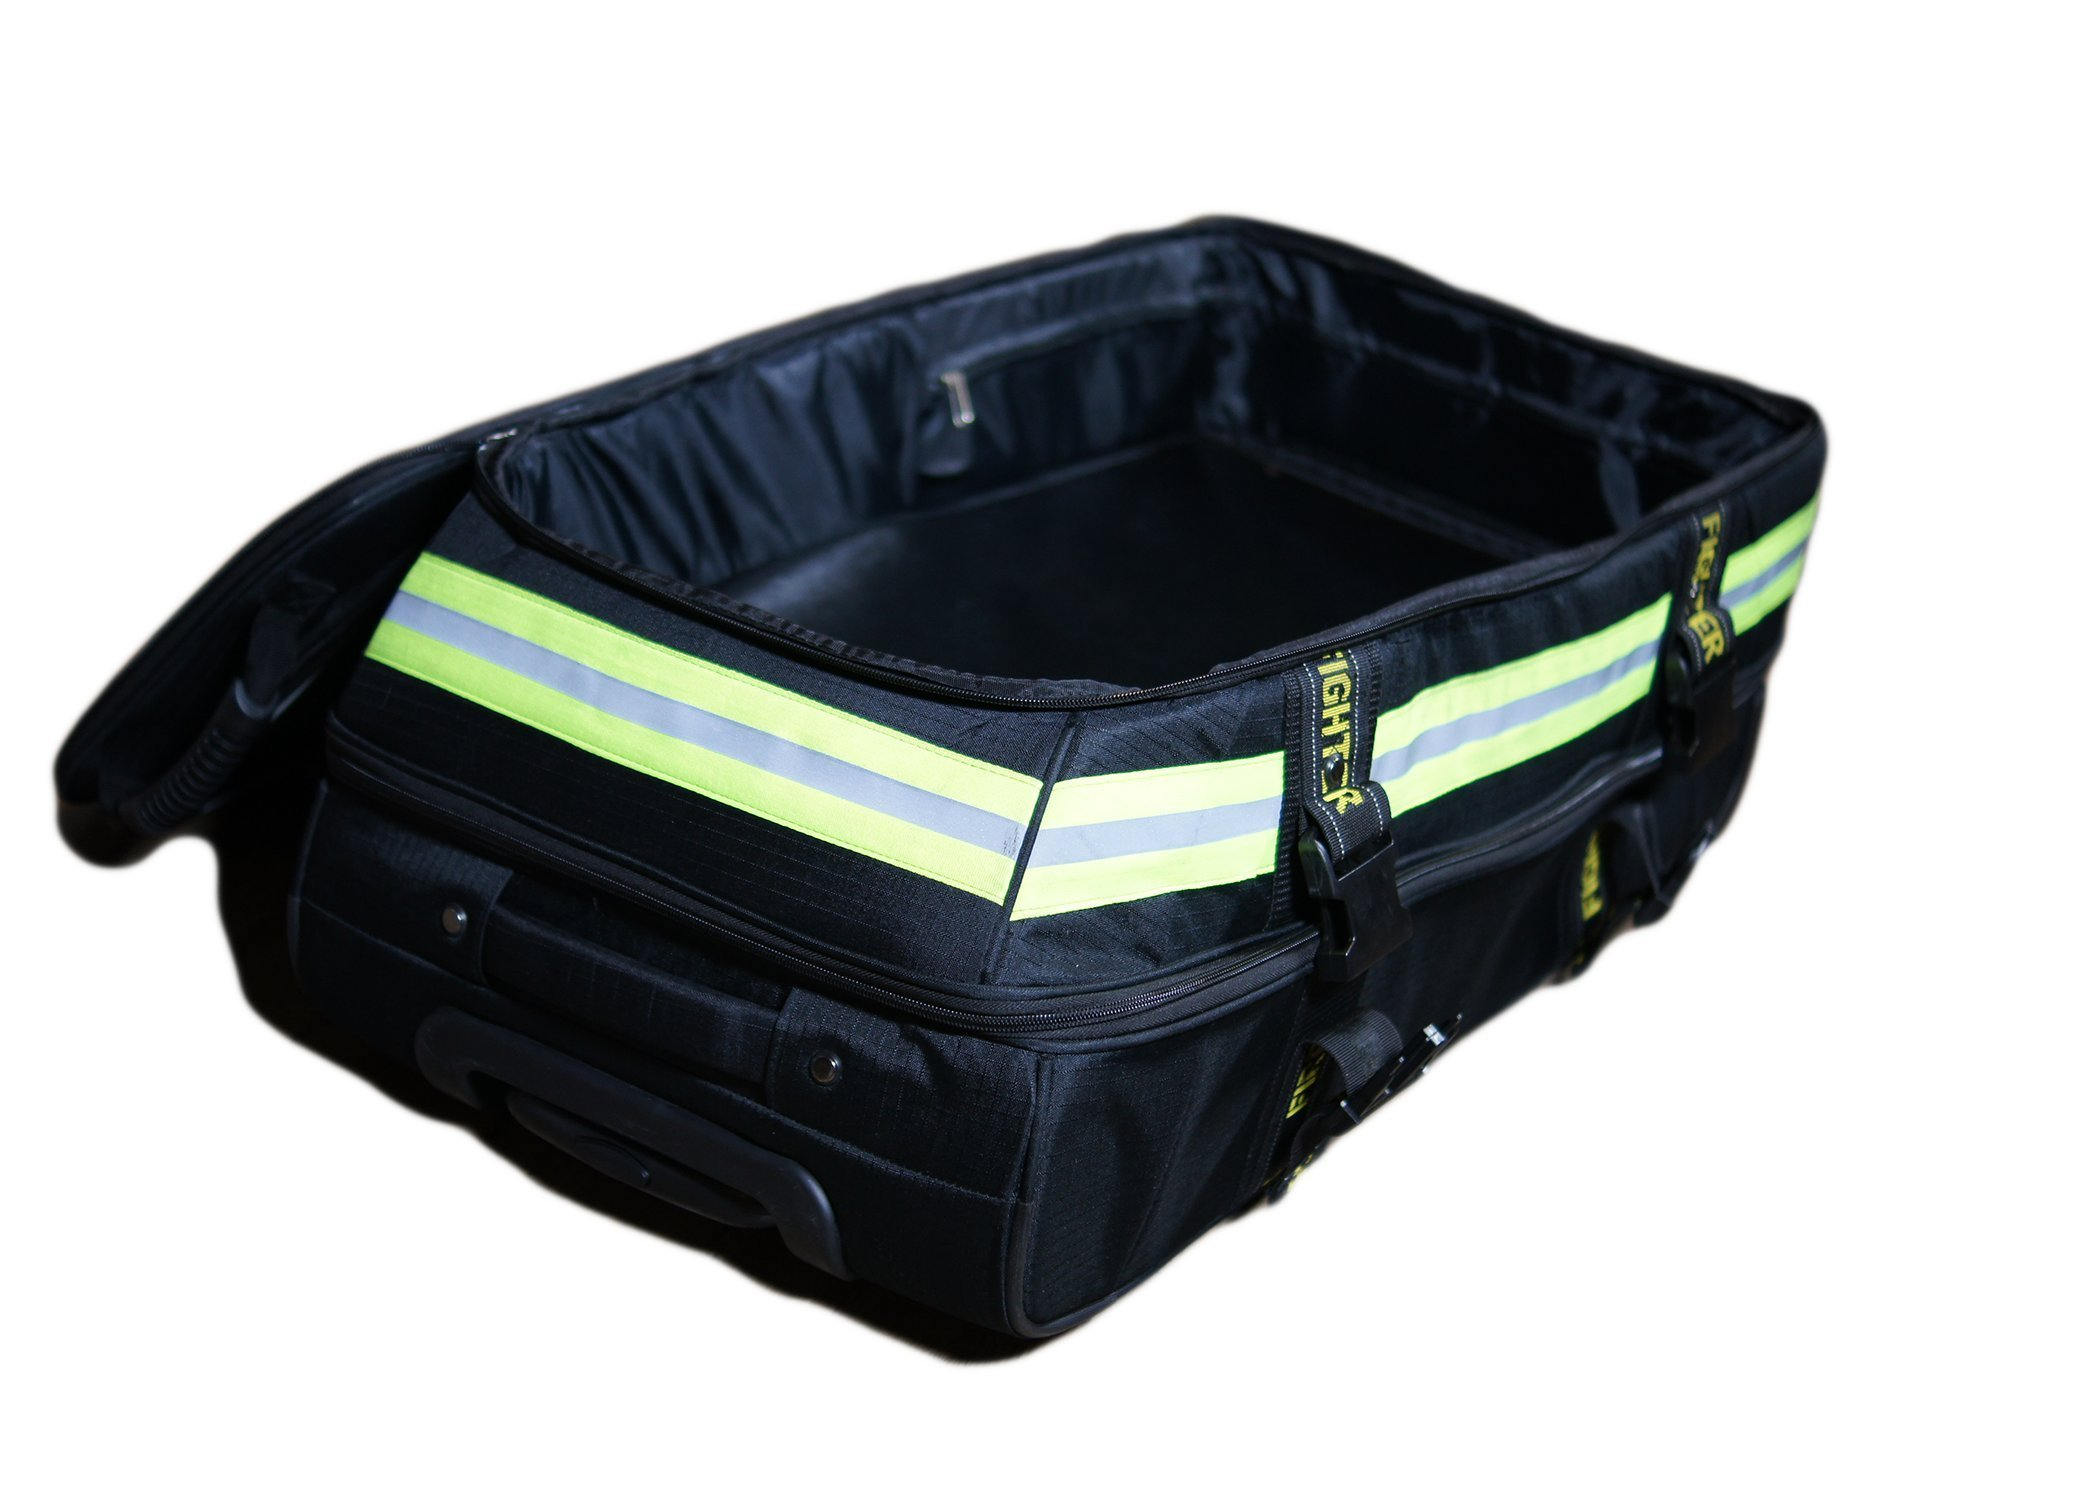 Fireflex Firefighter Rolling Travel Bag (Black) by Firefighters Merchandise (Image #3)